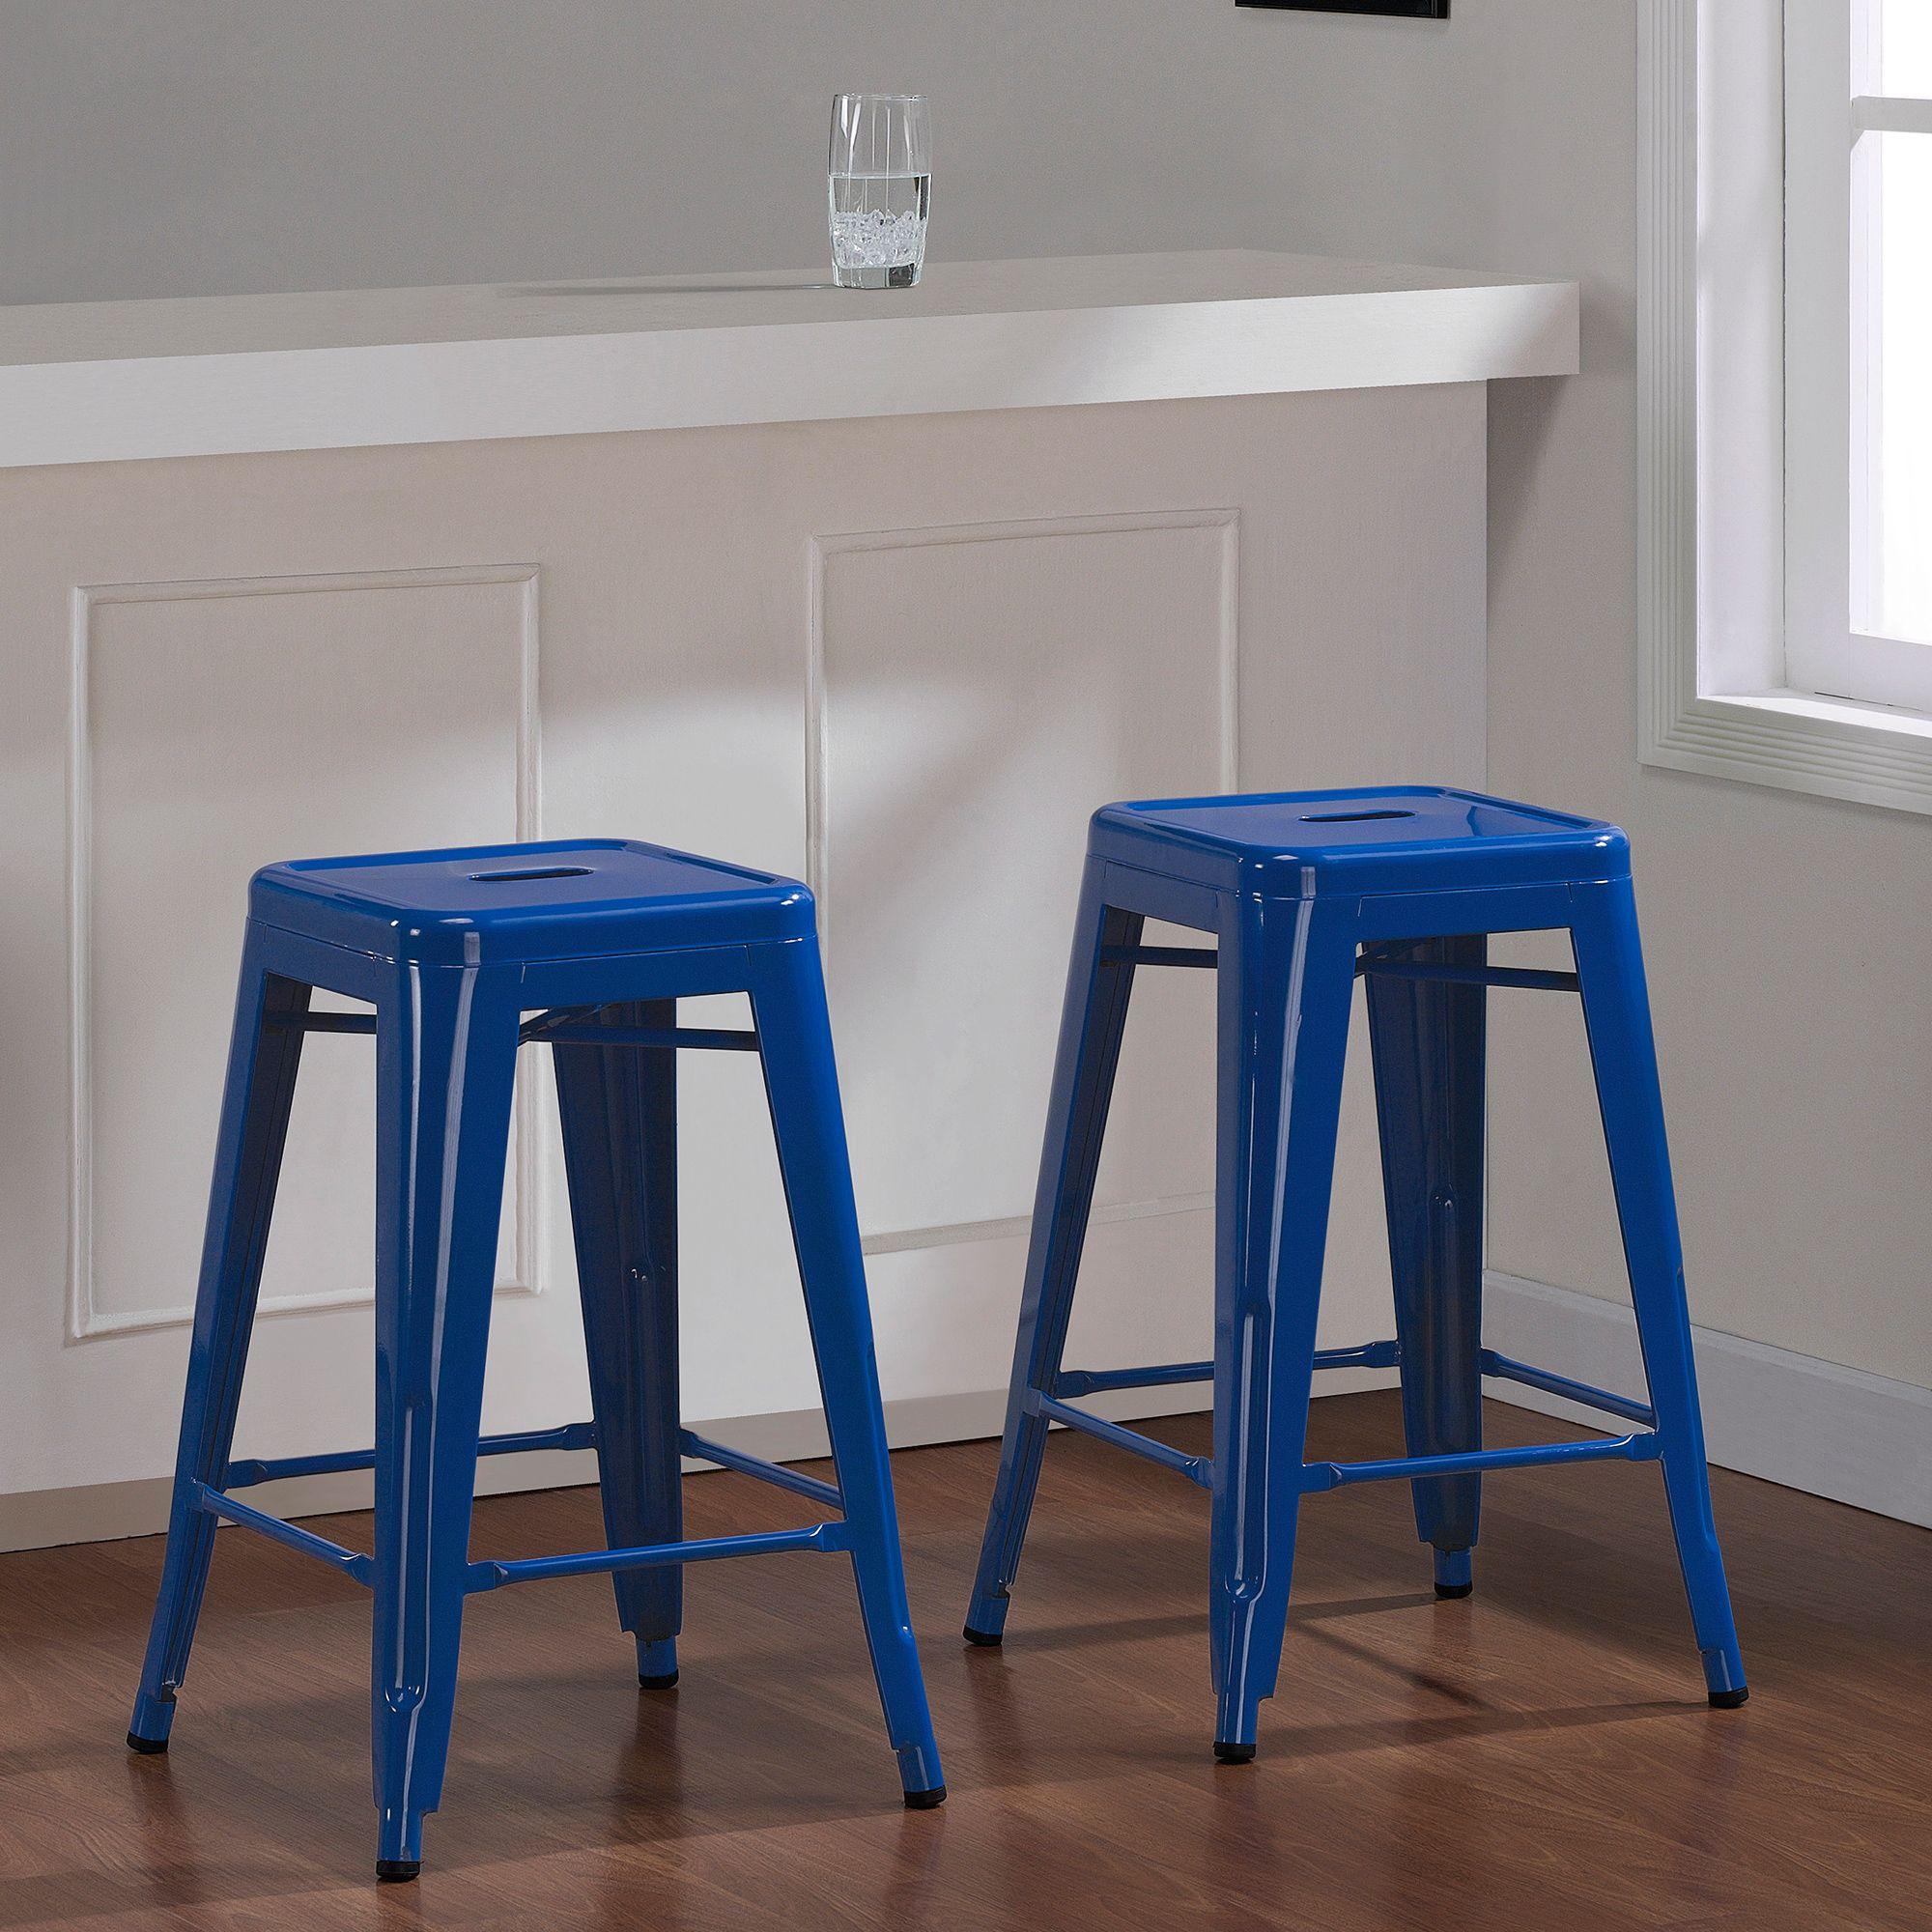 Tabouret 24 inch Baja Blue Metal Counter Stool